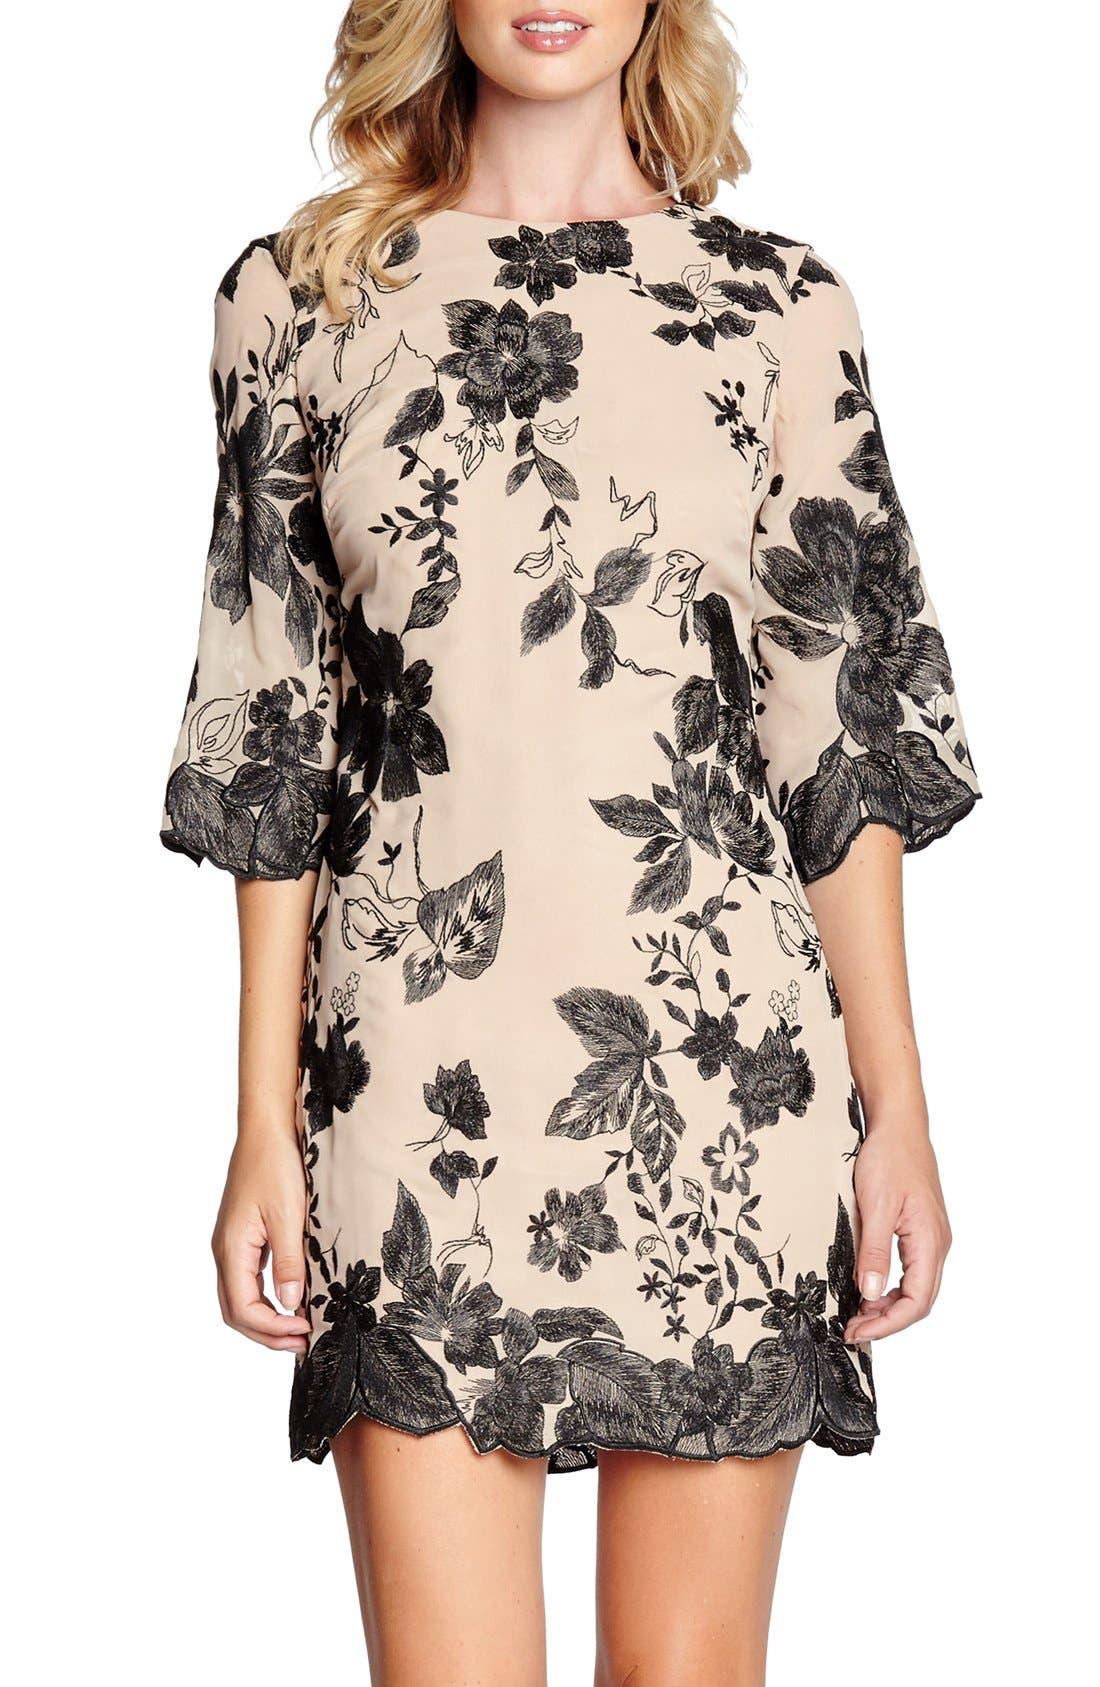 Alternate Image 1 Selected - Dress the Population 'Paige' Metallic Embroidered Chiffon Shift Dress